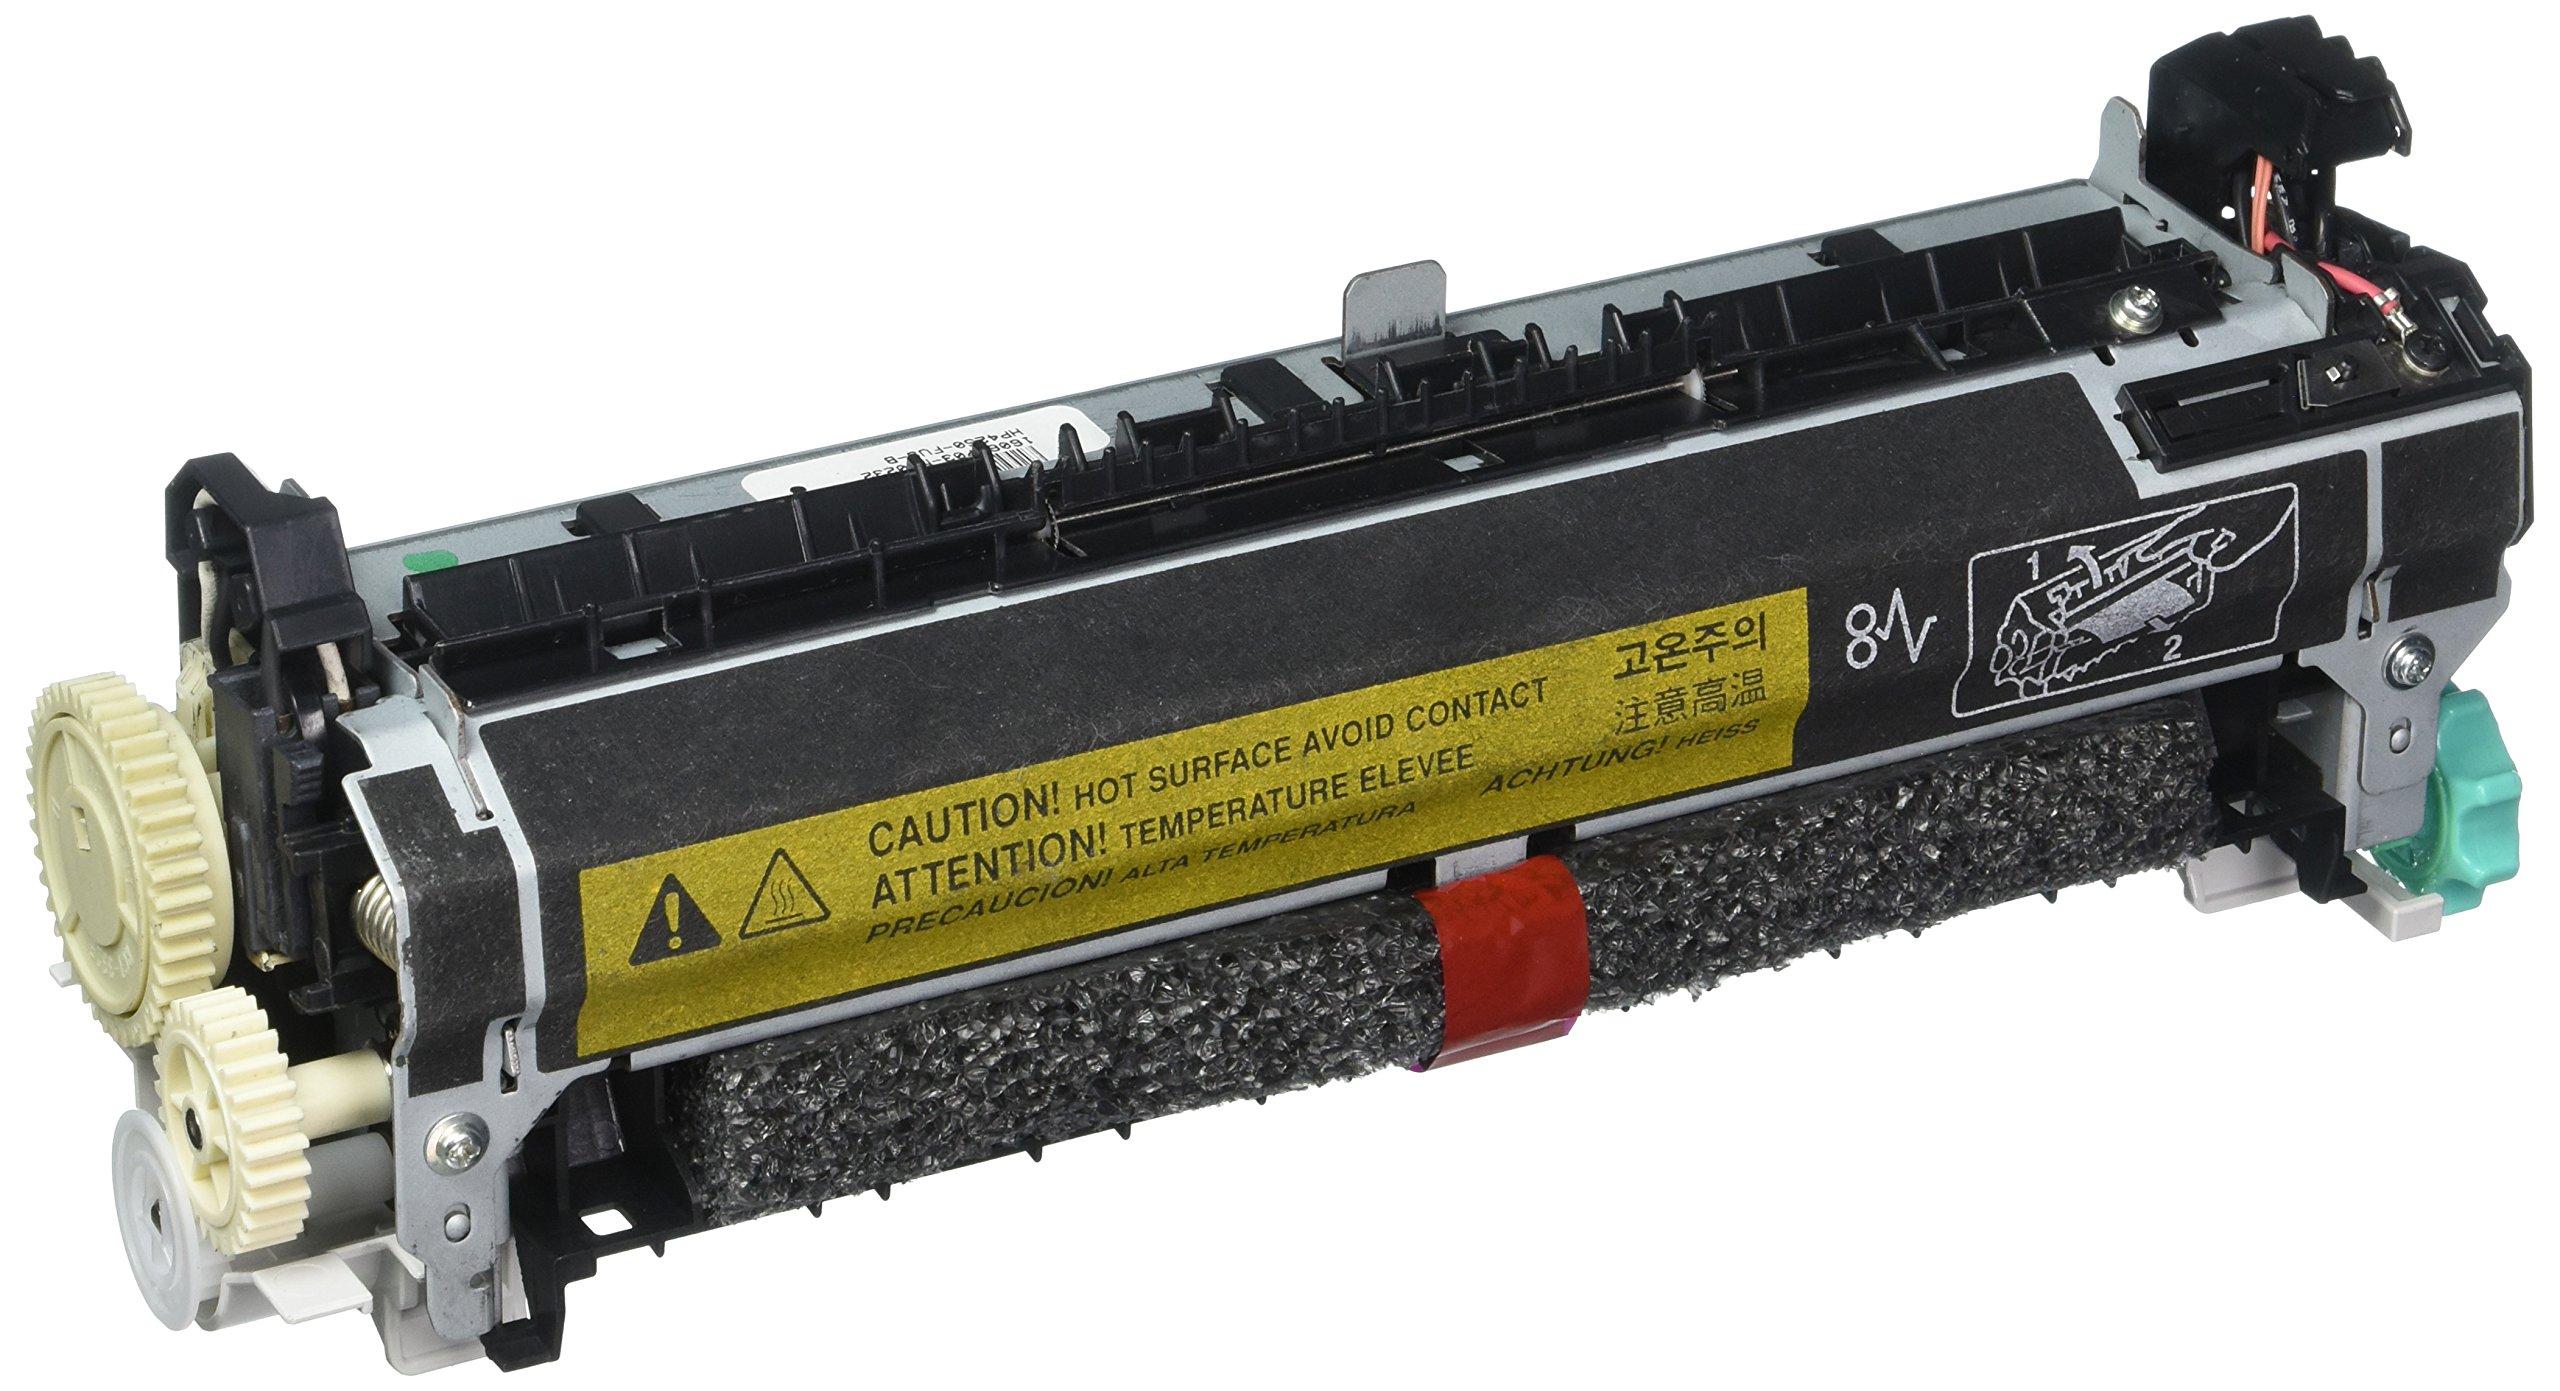 Premium Compatibles Inc. RM1-1082-RPC Replacement Fuser for HP Printers, Black